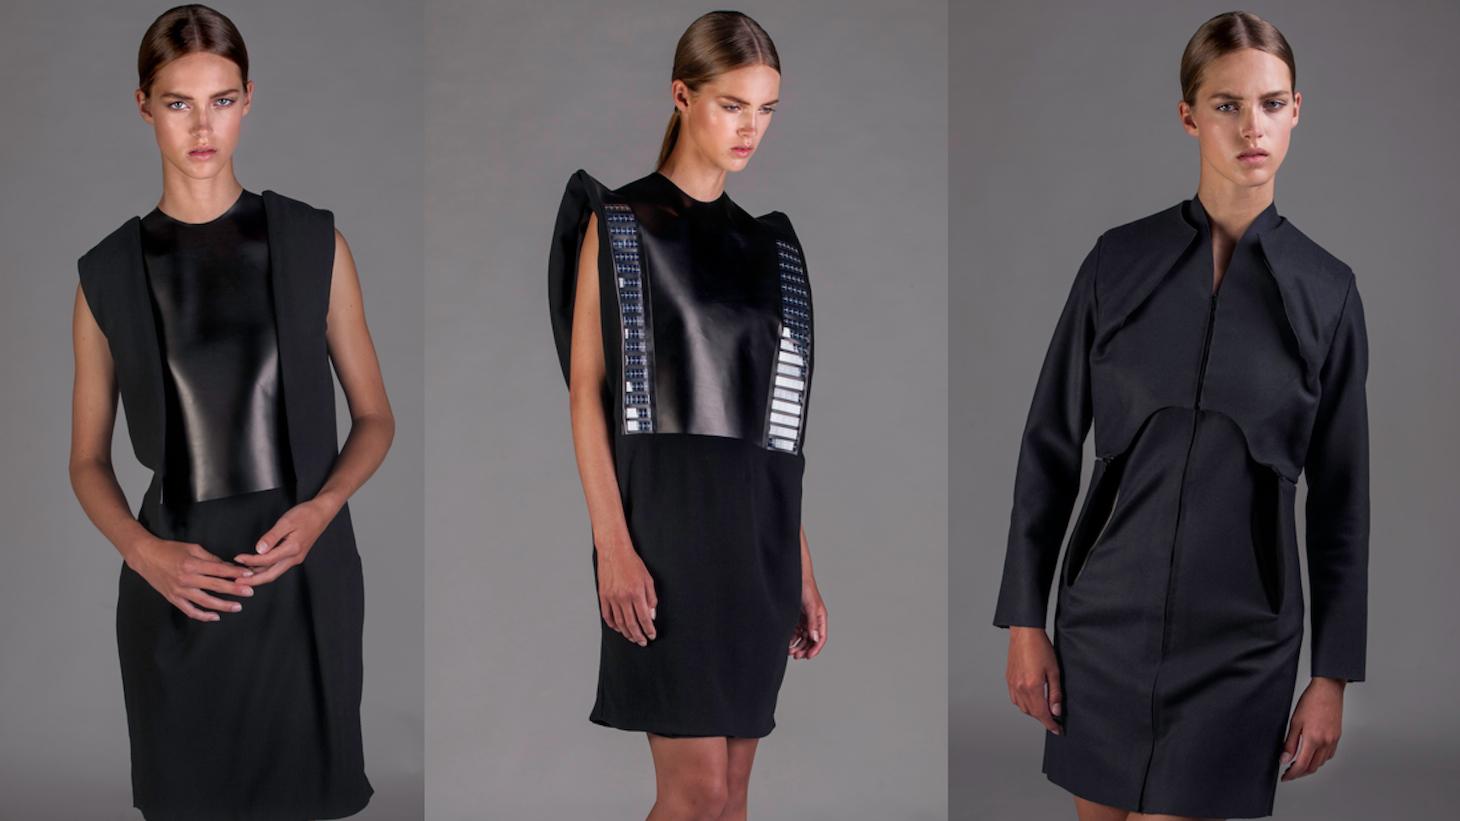 Solar Panel Fashion Collection Stylus